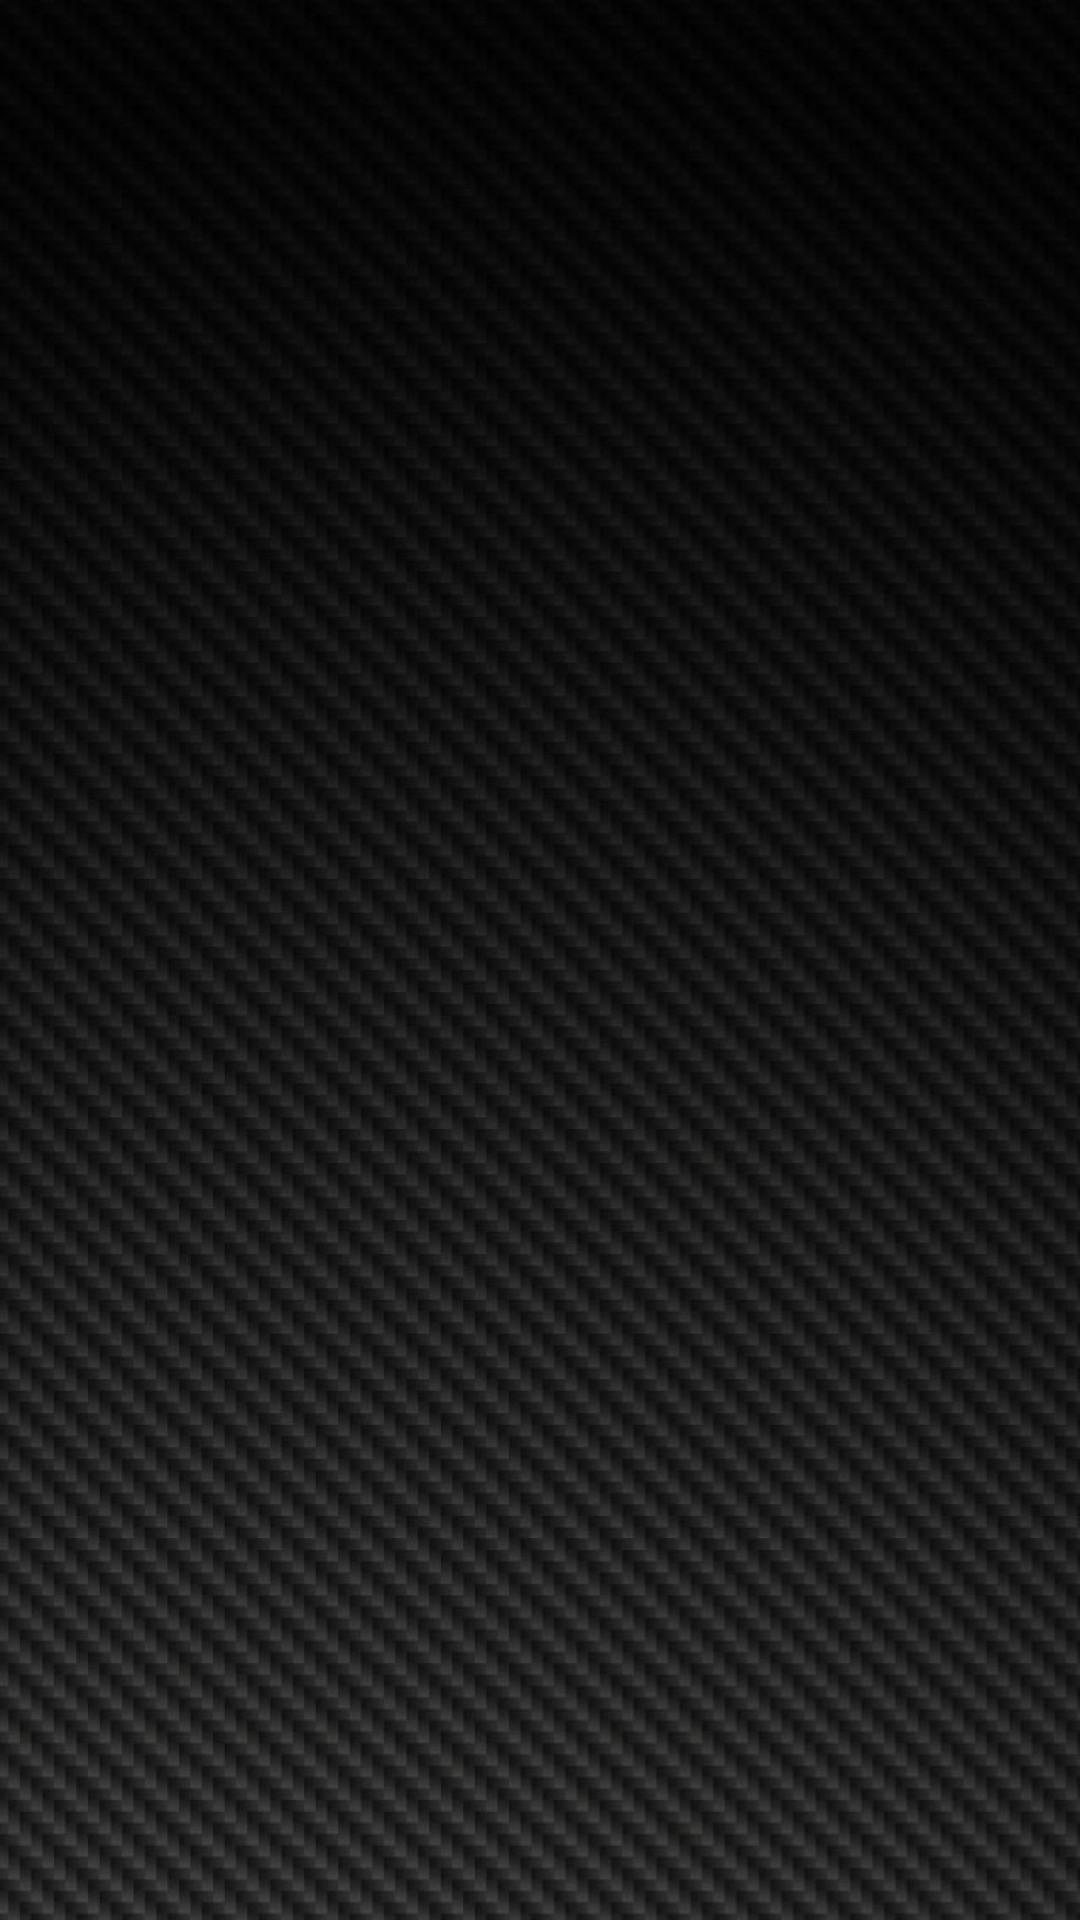 Christmas Wallpaper Iphone 6 Carbon Fiber Iphone Wallpaper Hd Pixelstalk Net